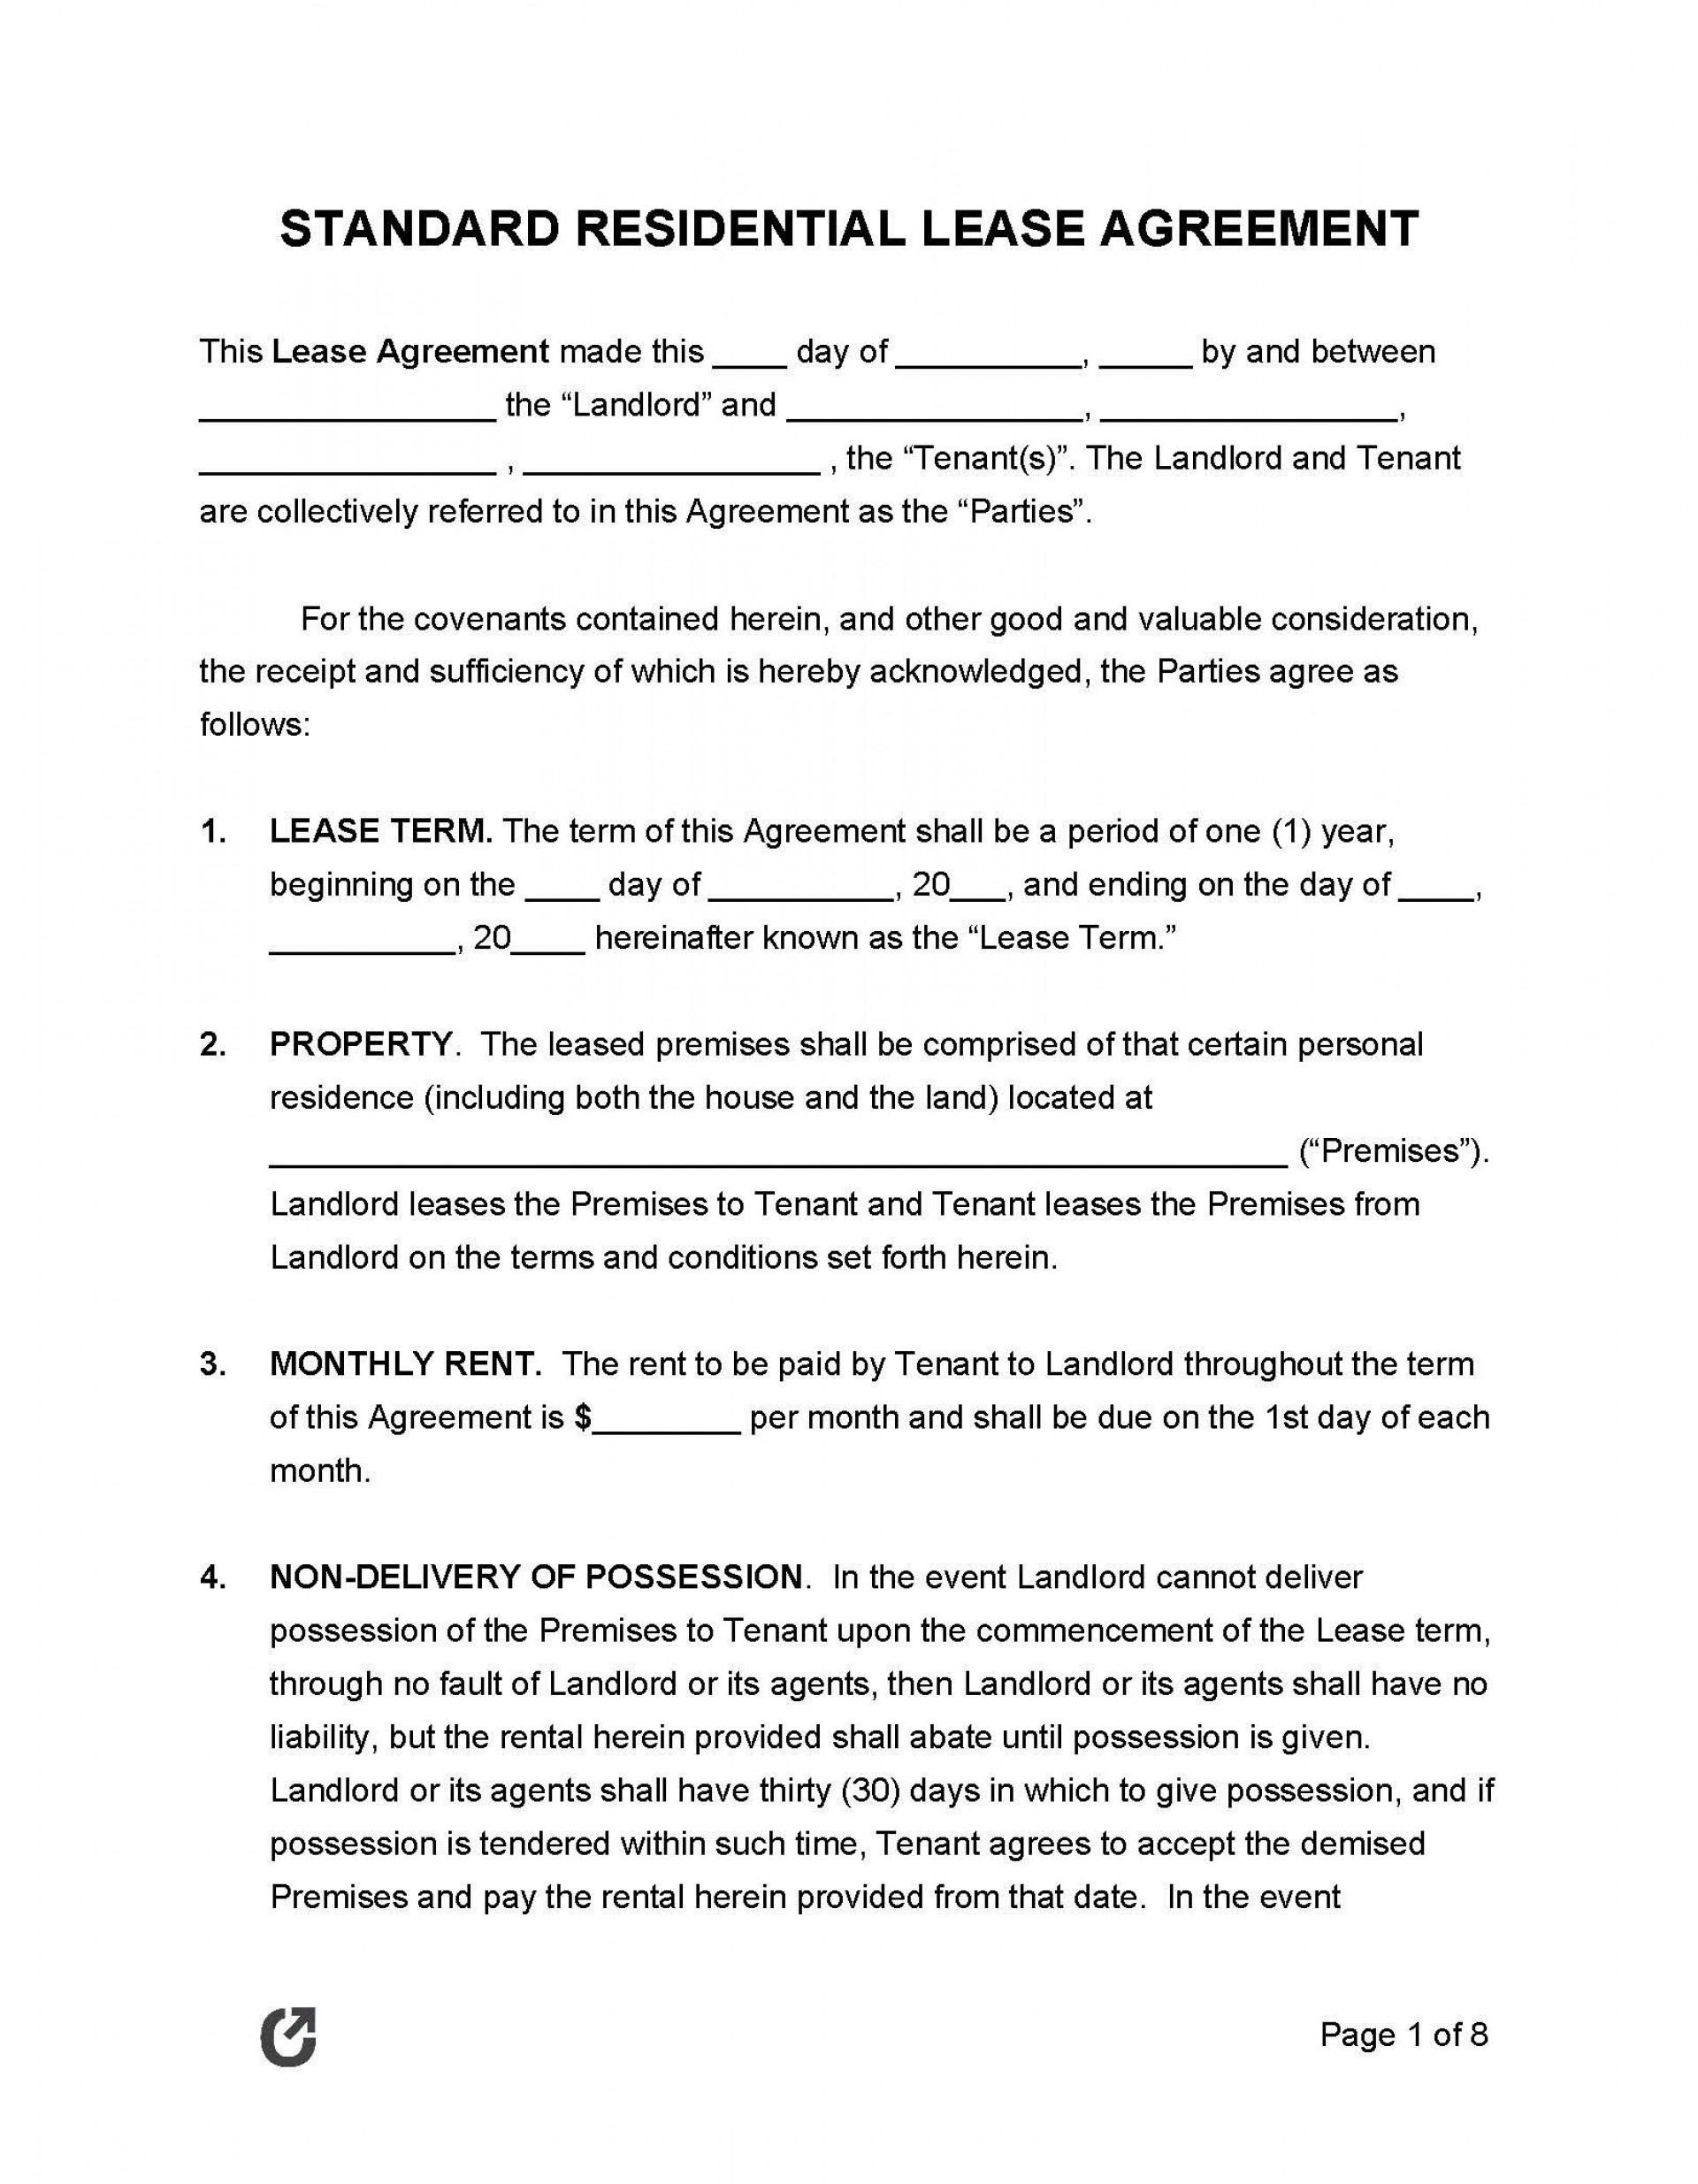 008 Surprising Residential Lease Agreement Template Photo  Tenancy Form Alberta California1920